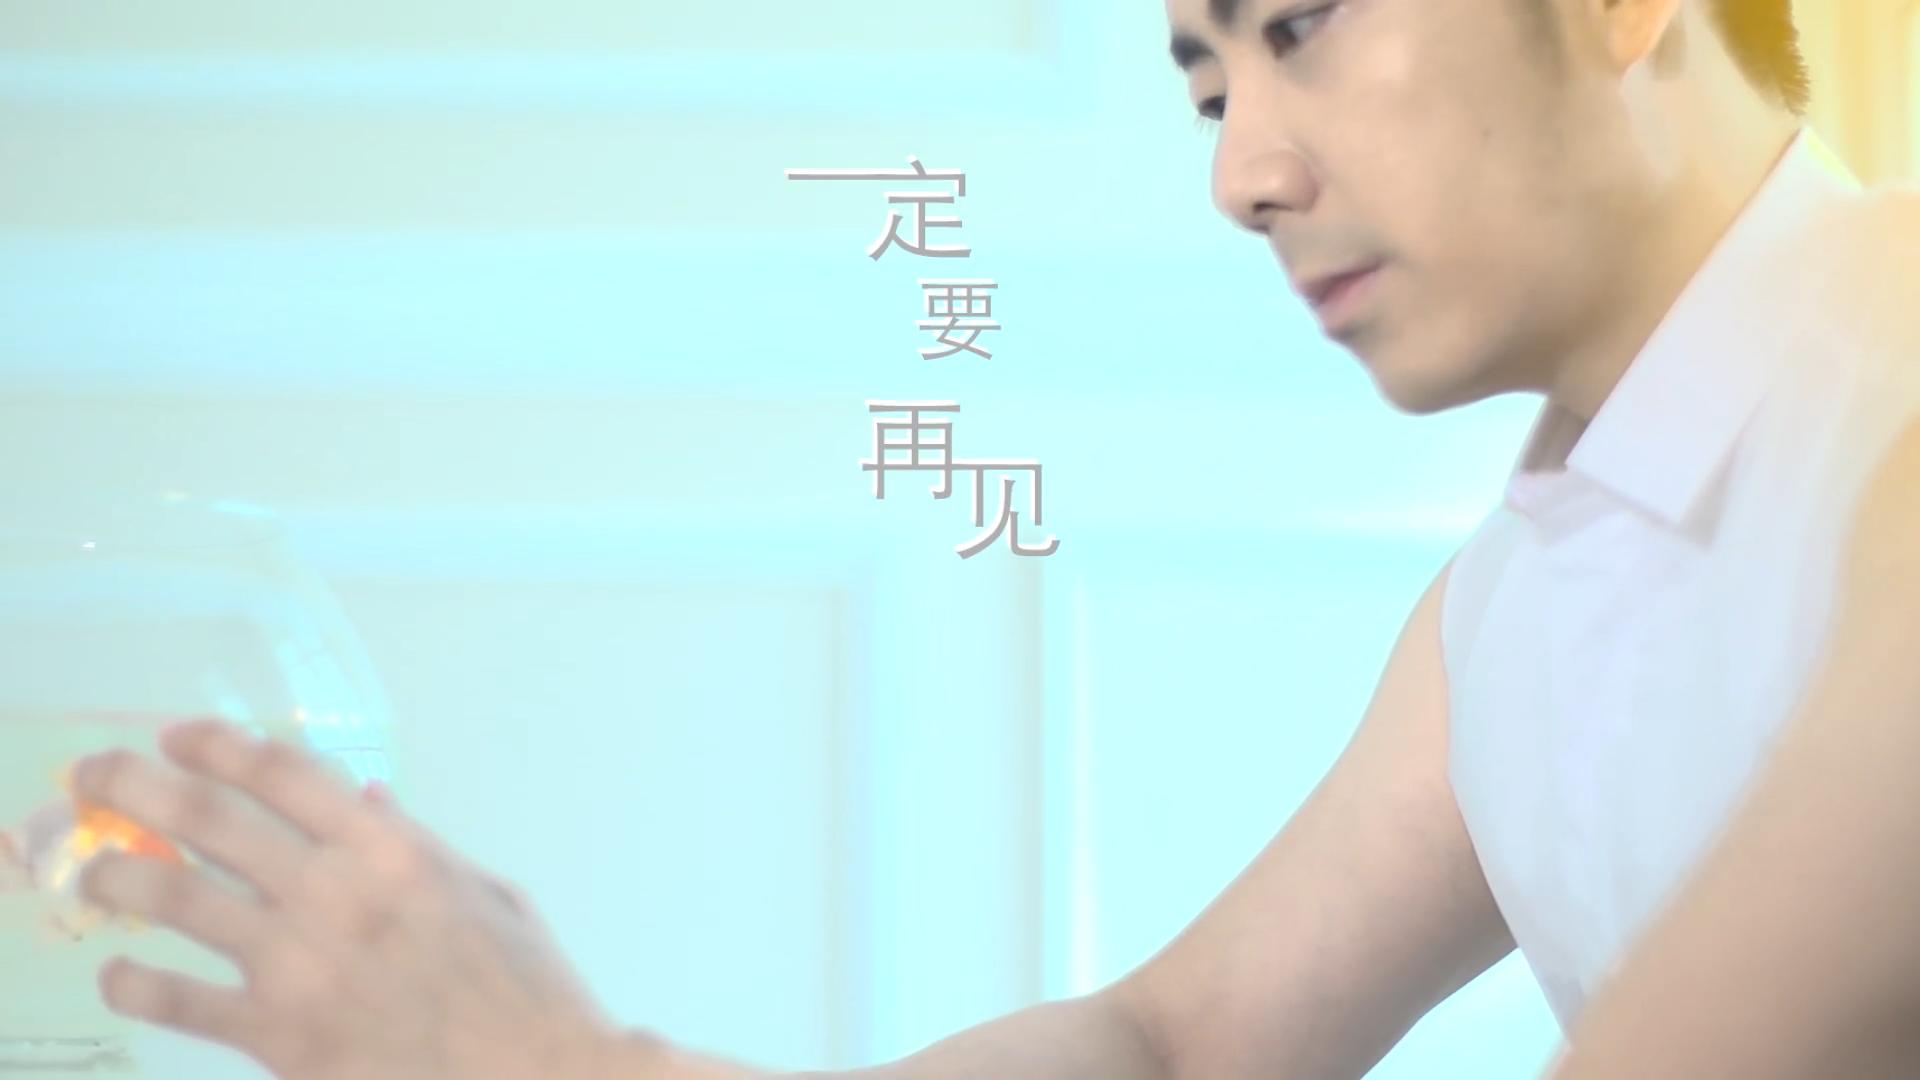 Nick 钟盛忠 & Stella 钟晓玉《一定要再见》官方MV Official Music Video